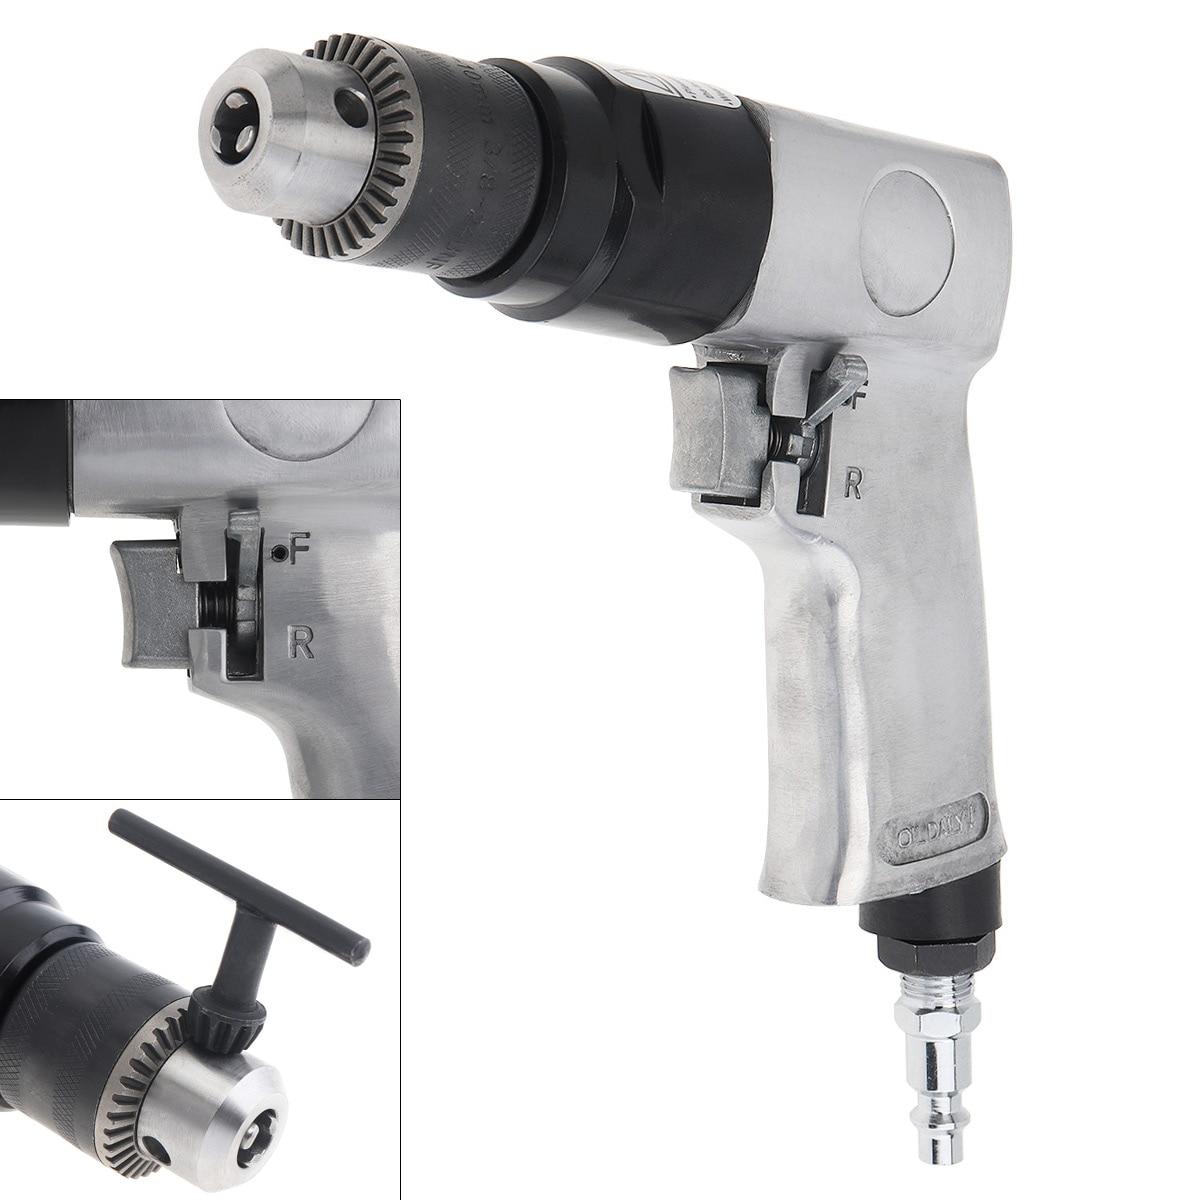 Pneumatic Hand Drill 1.5-10mm Pneumatic Drill Hand-held Reversing Air Drill